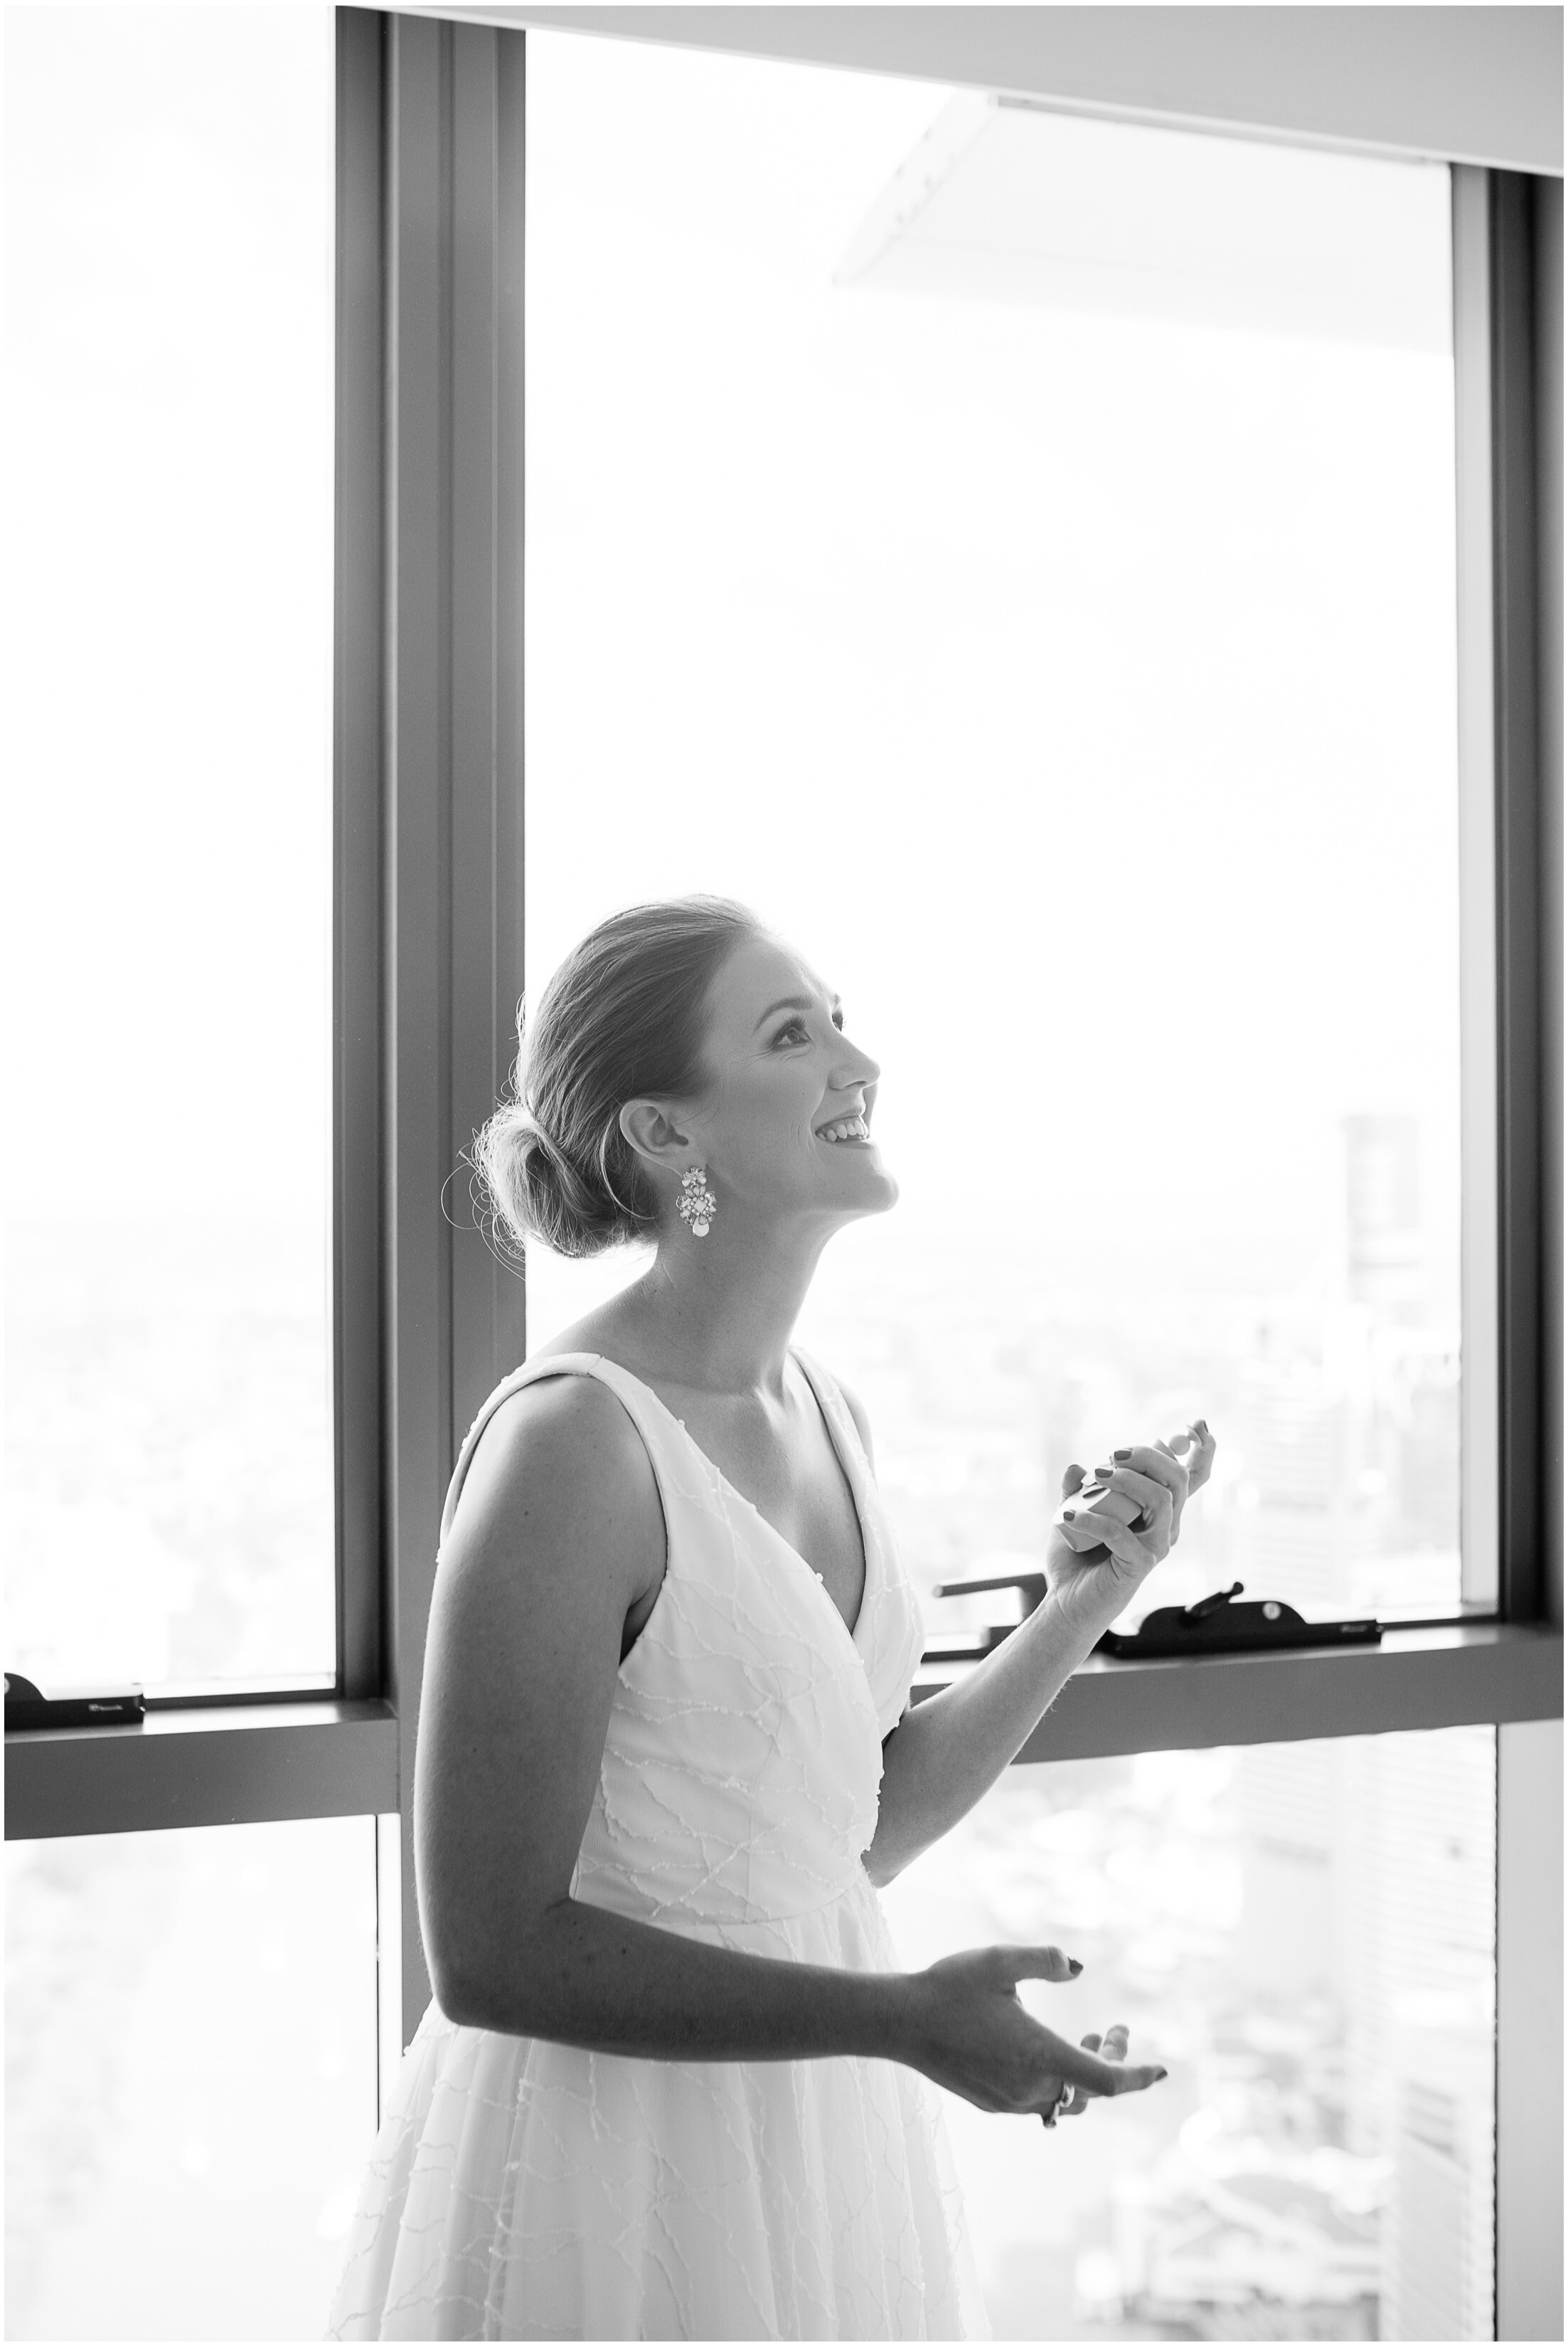 refinery-brisbane-wedding-photography-film-photographer-fine-art-16.jpg